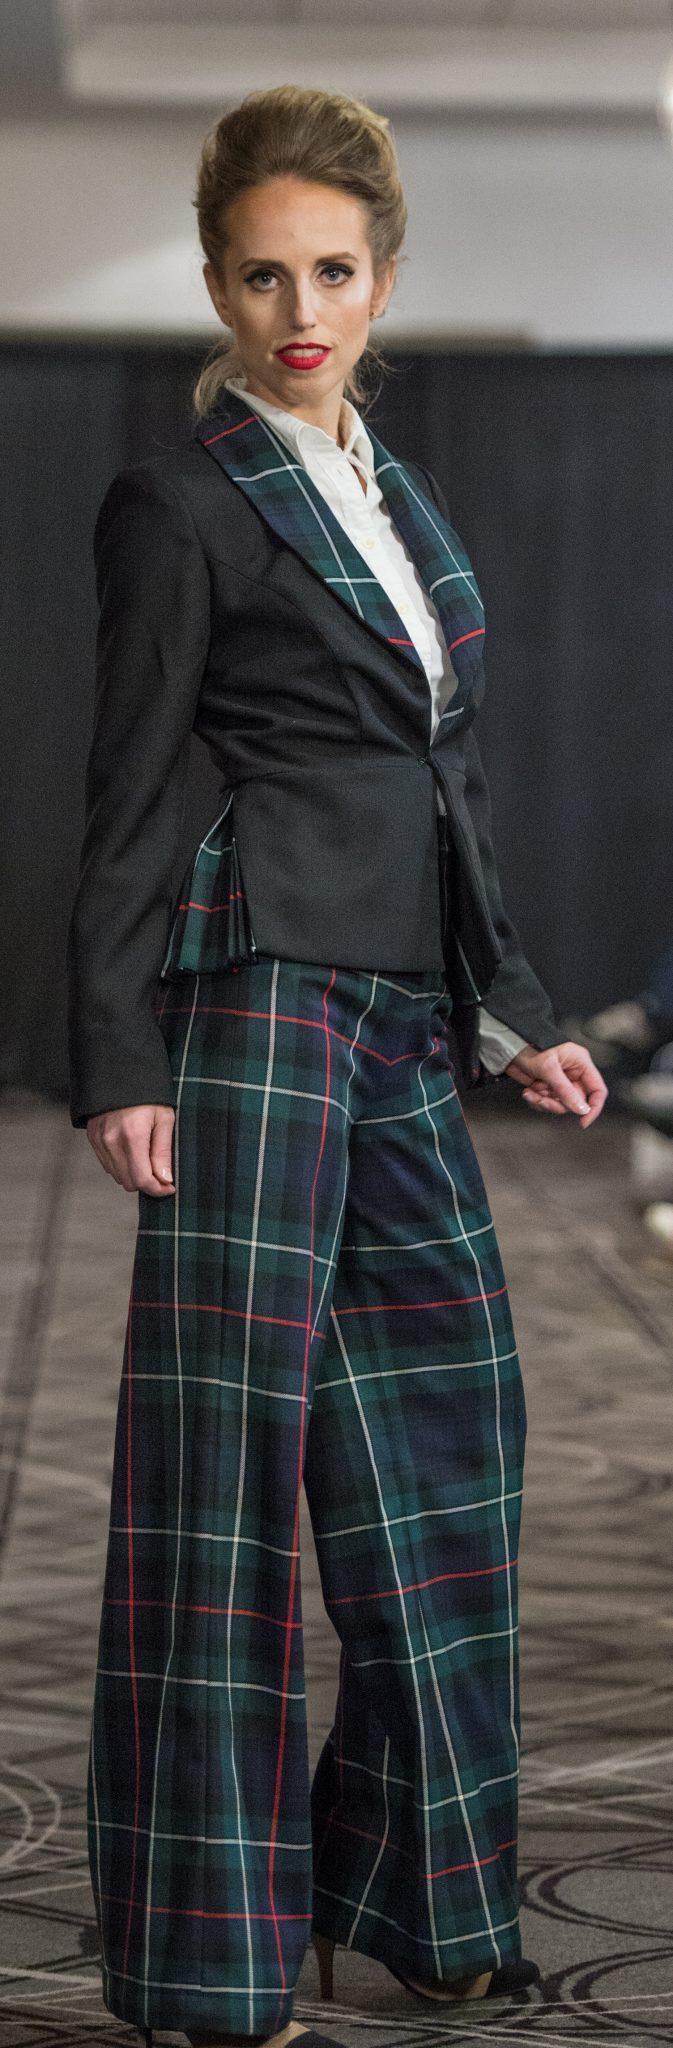 Veronica MacIsaac Prince George 2014-0266